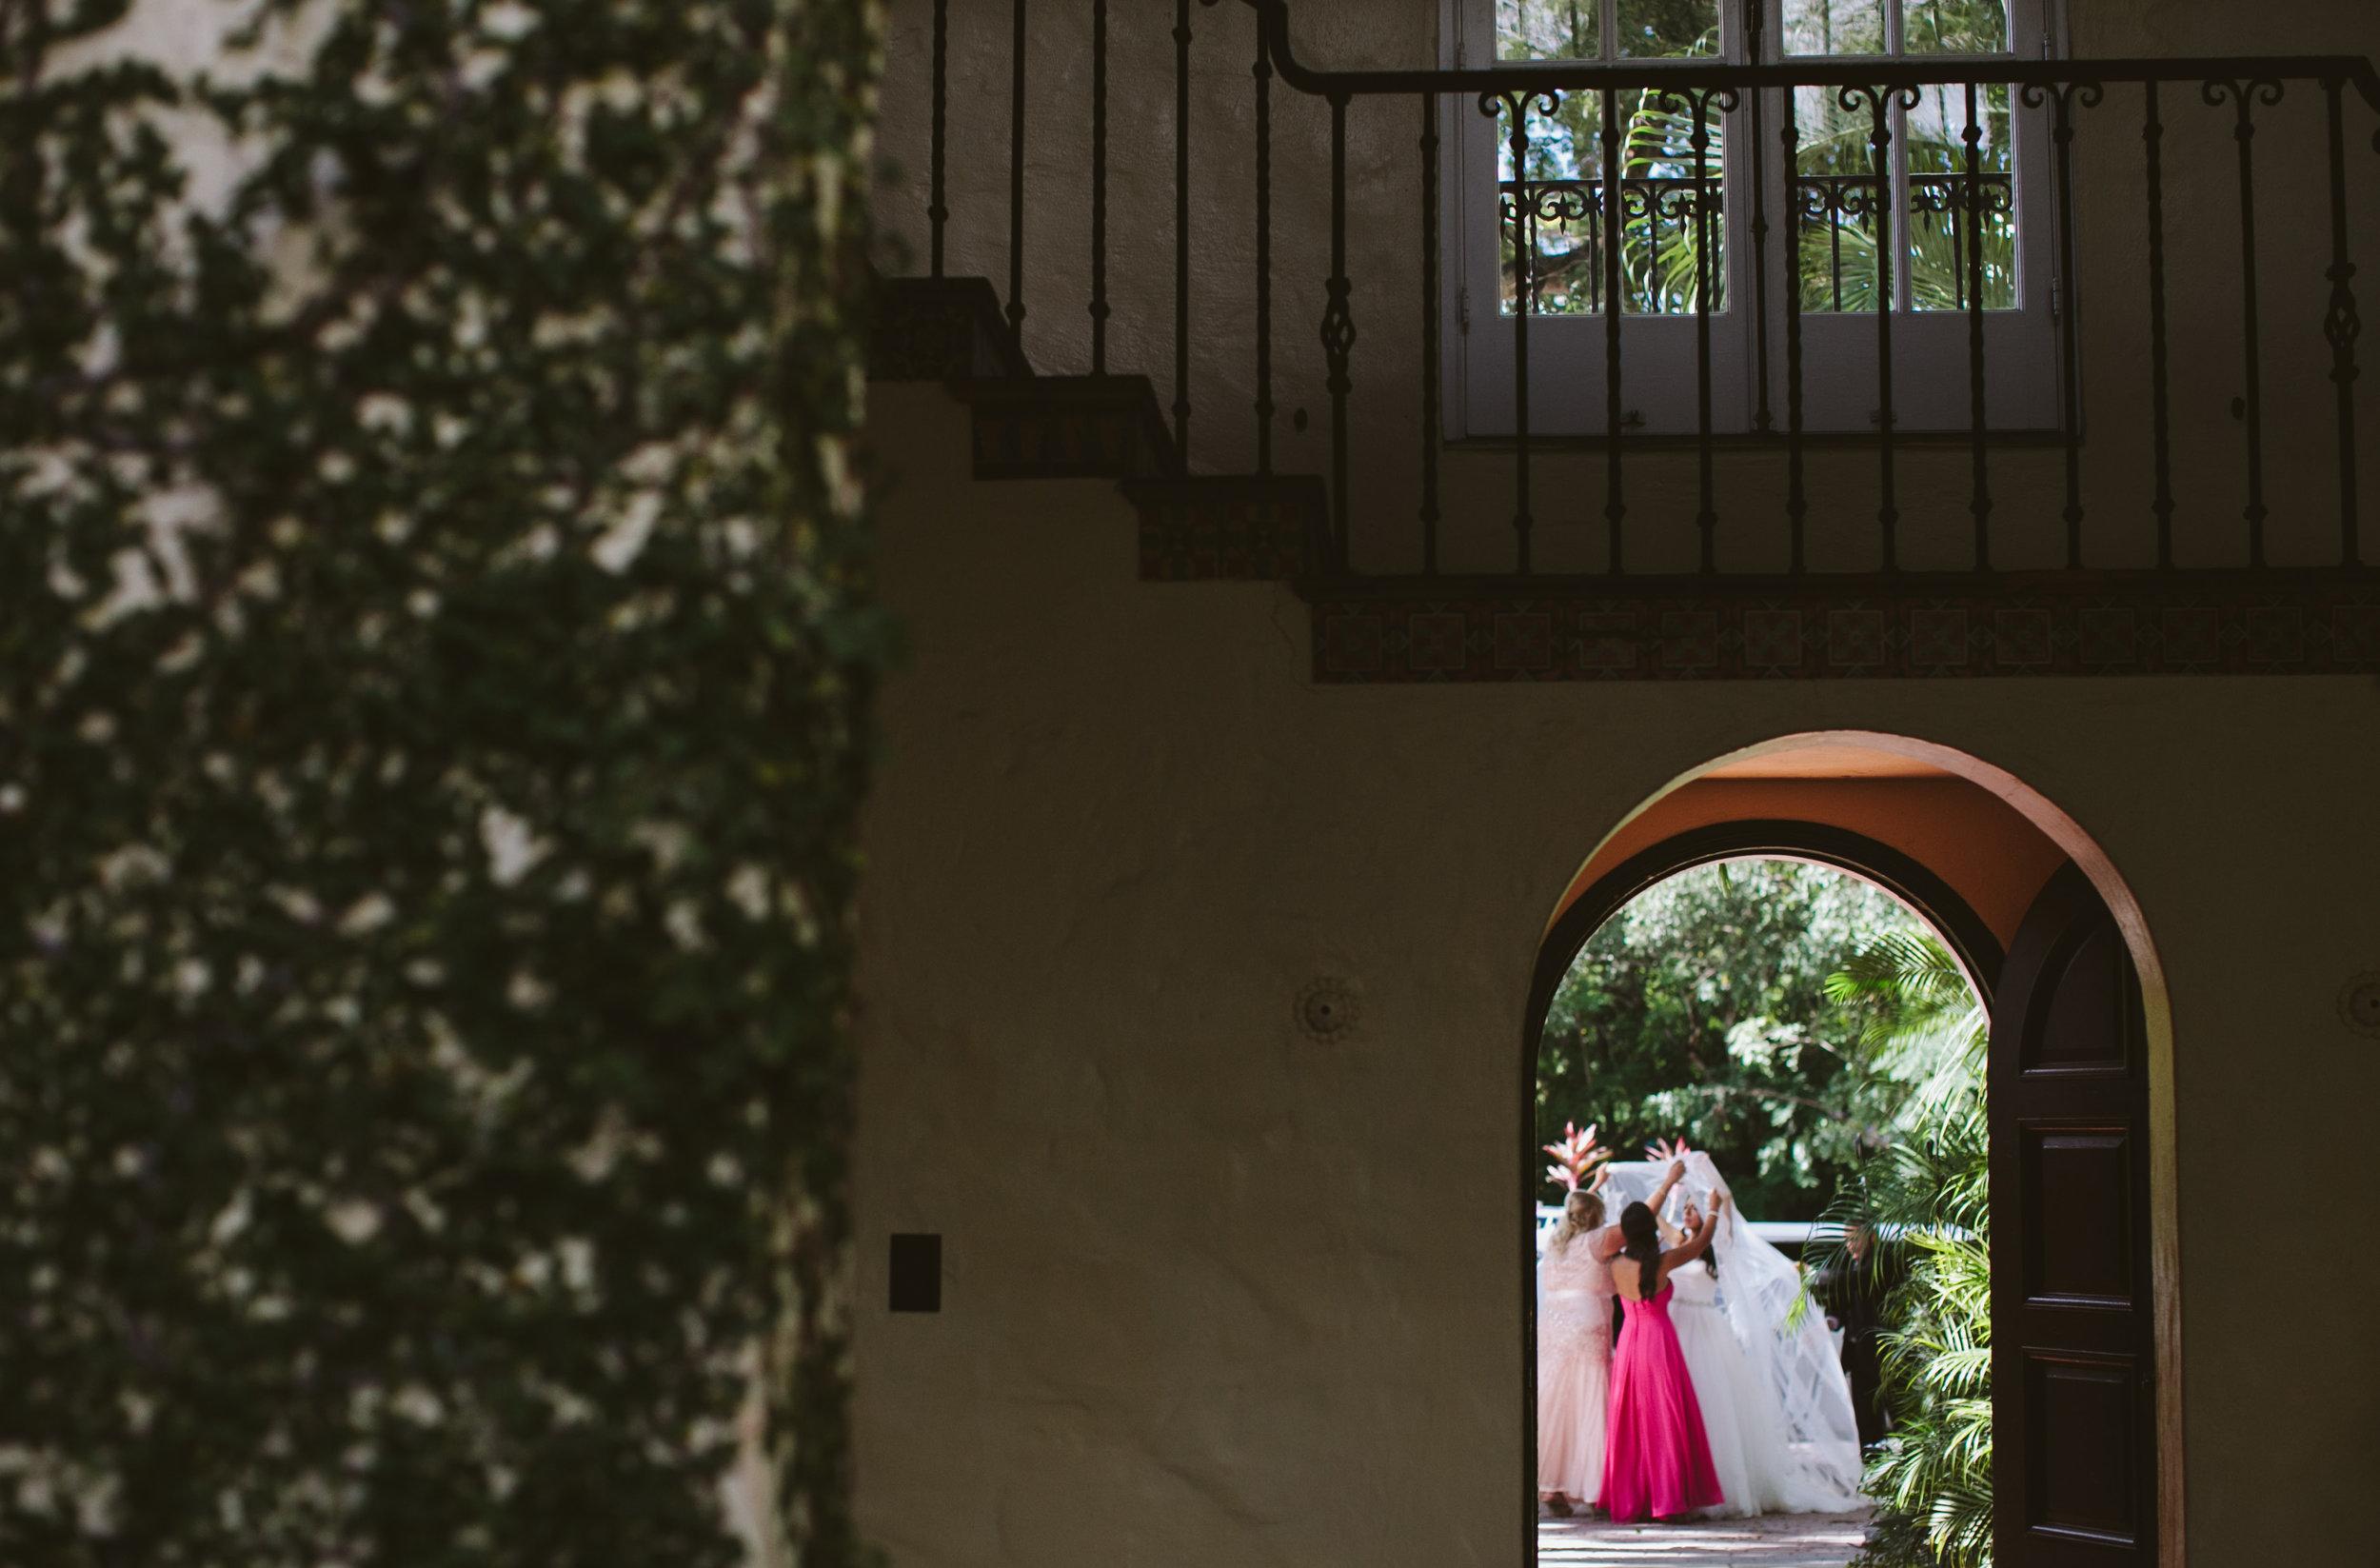 Meli + Mike Coconut Grove Wedding at Villa Woodbine23.jpg